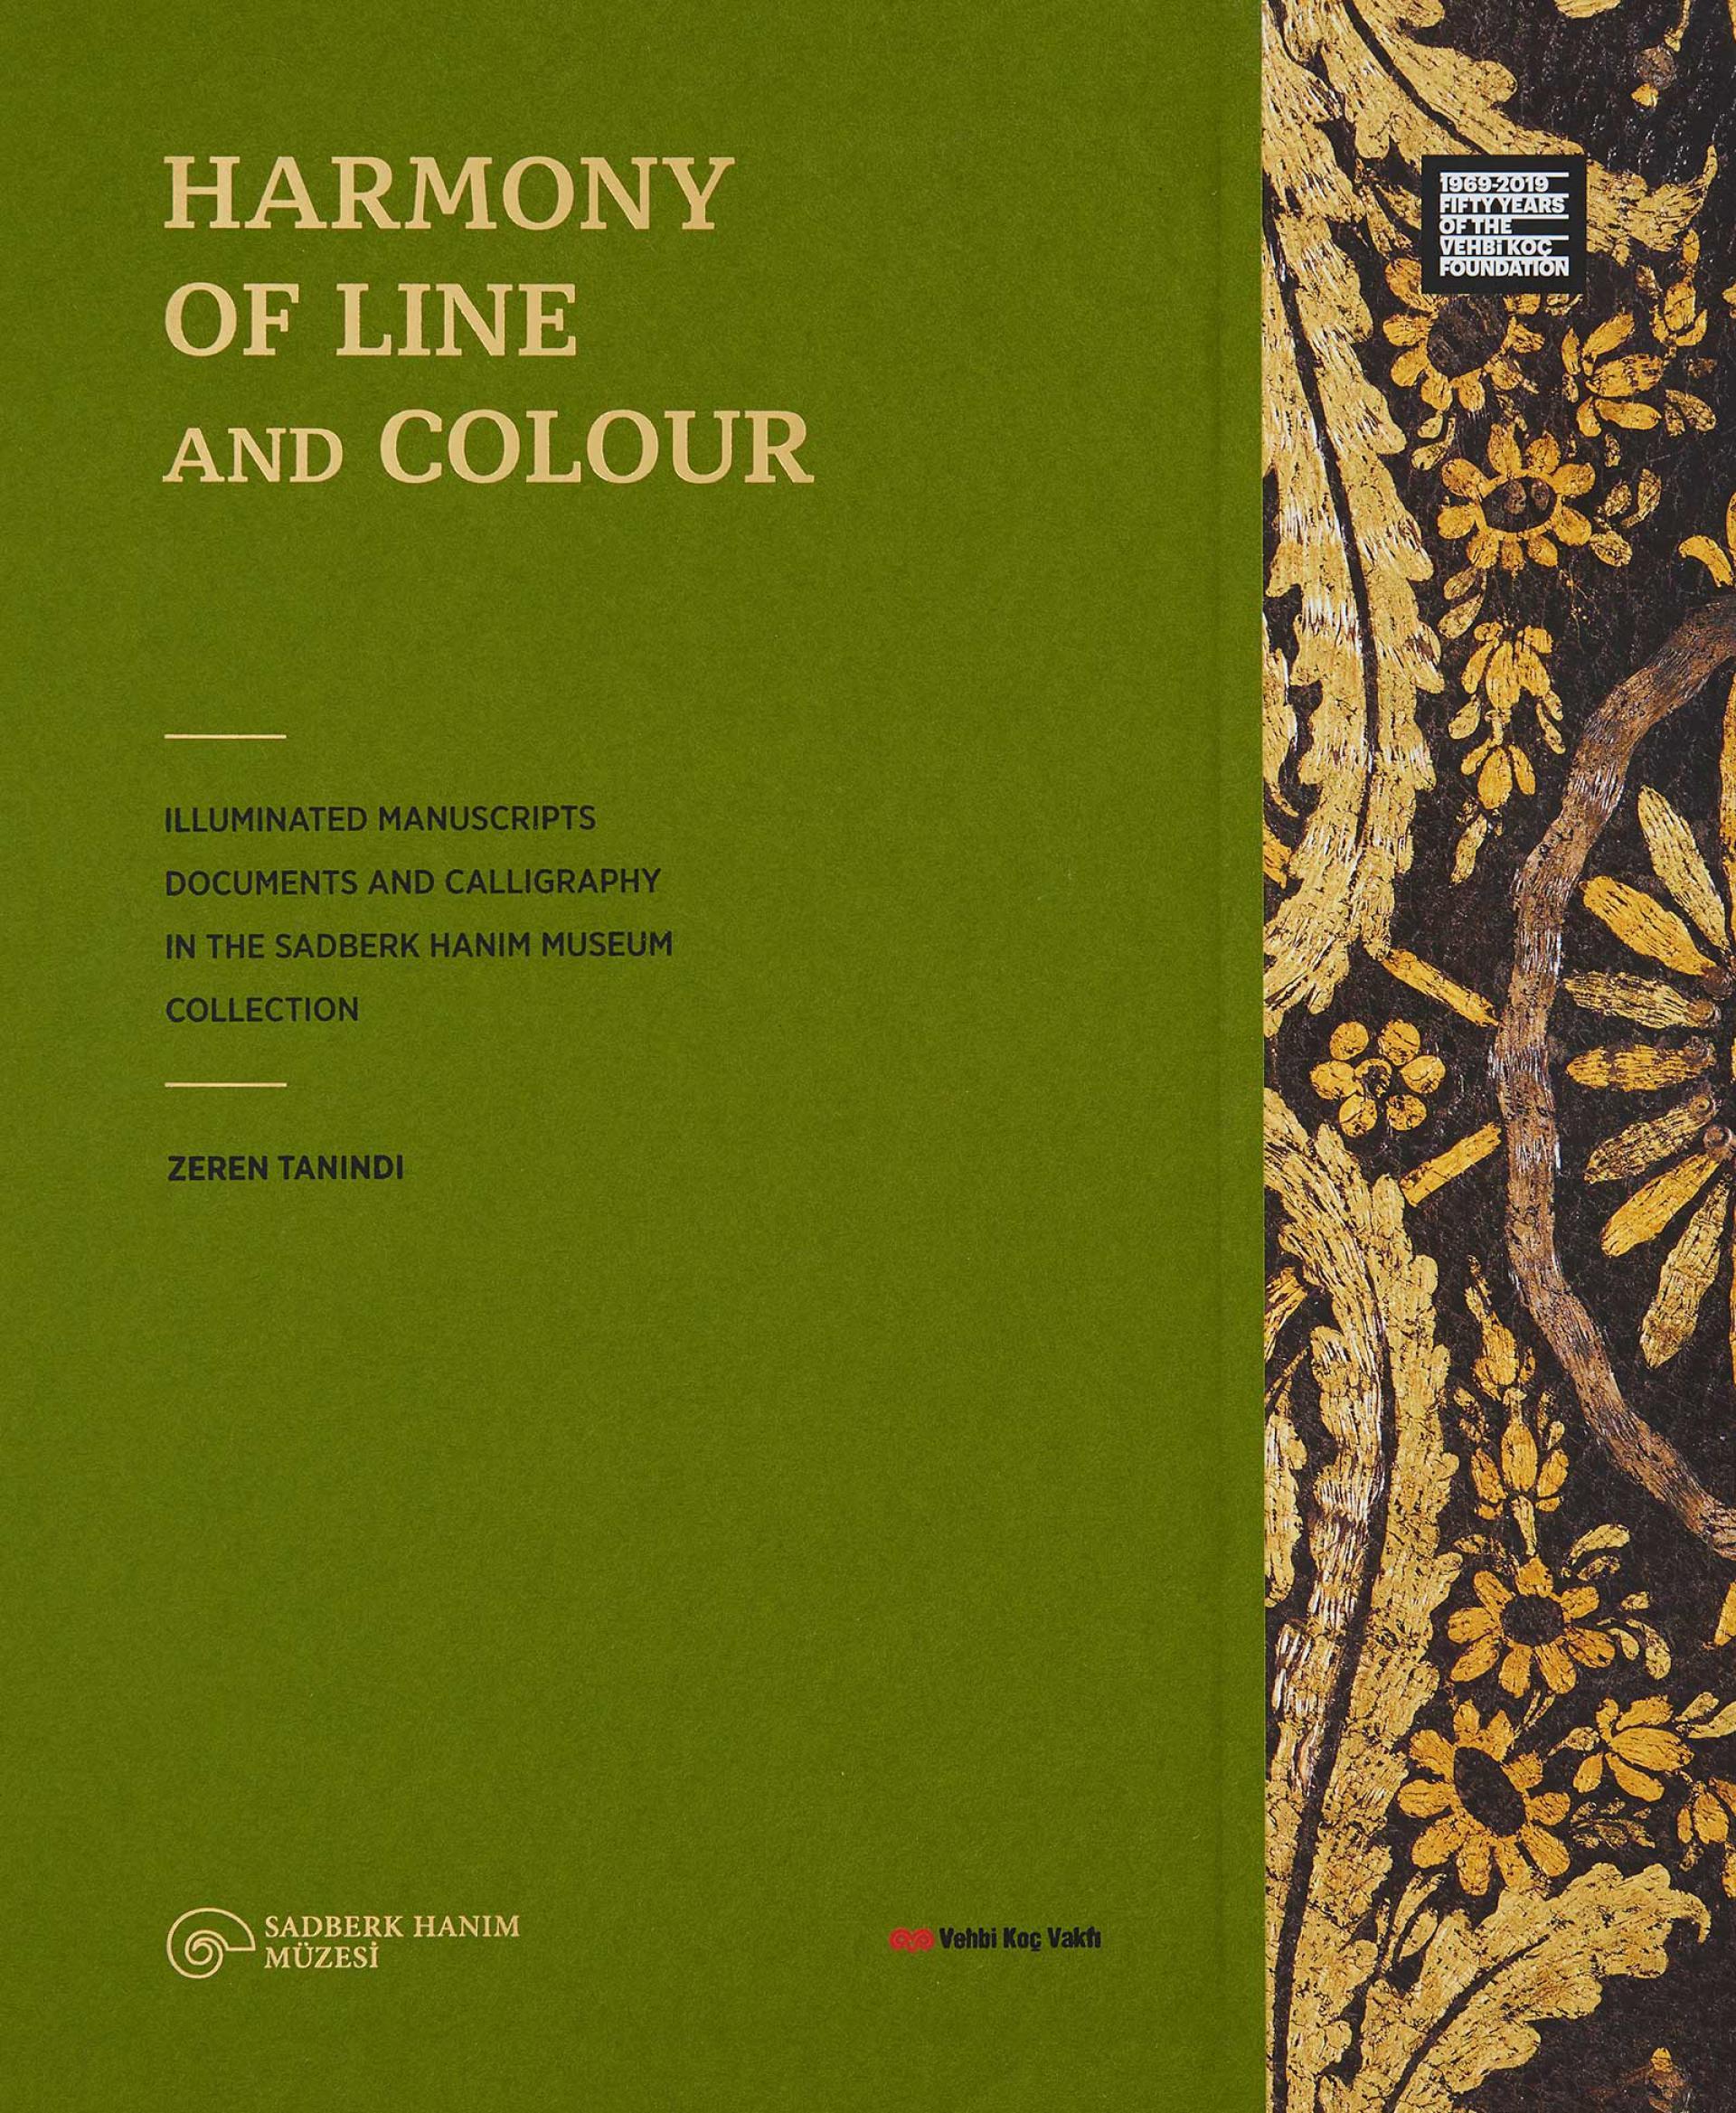 Harmony of Line and Colour - Illuminated Manuscripts, Documents and Calligraphy in the Sadberk Hanım Museum Collection - KİTAPLAR - Sadberk Hanım Müzesi